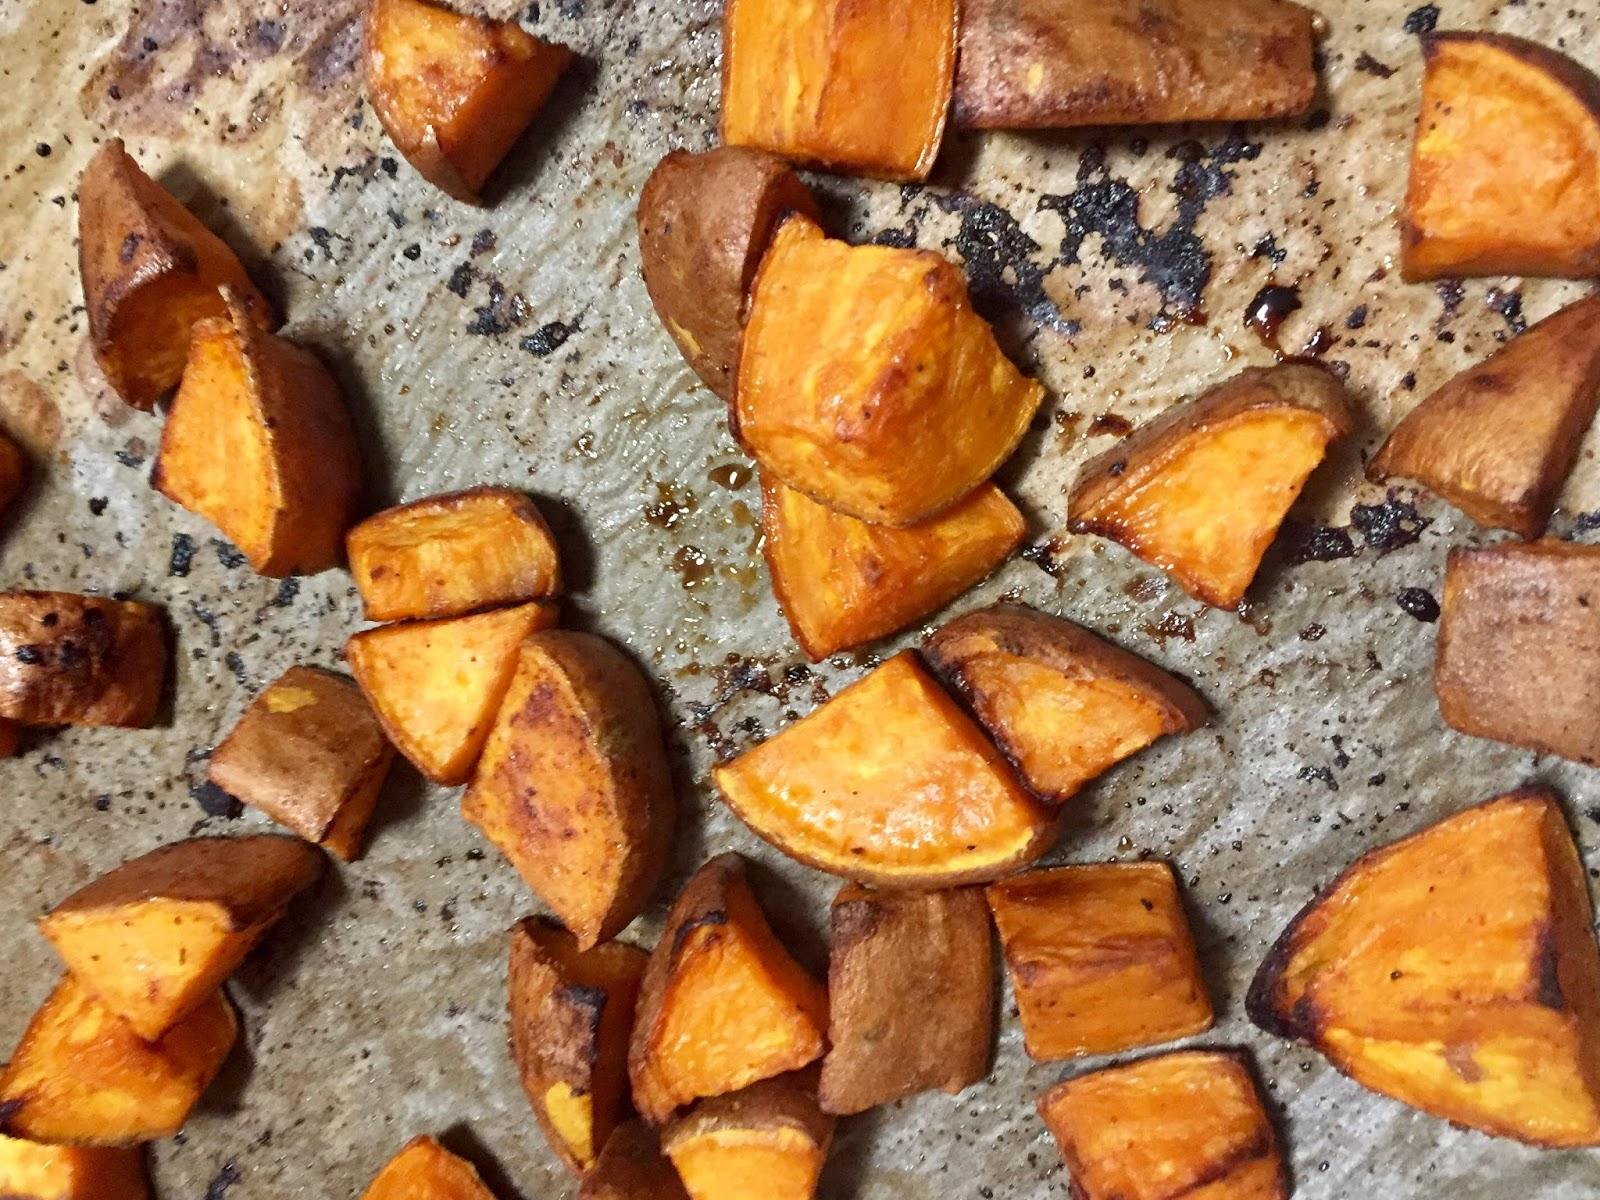 Teriyaki Sticky Sweet Potatoes